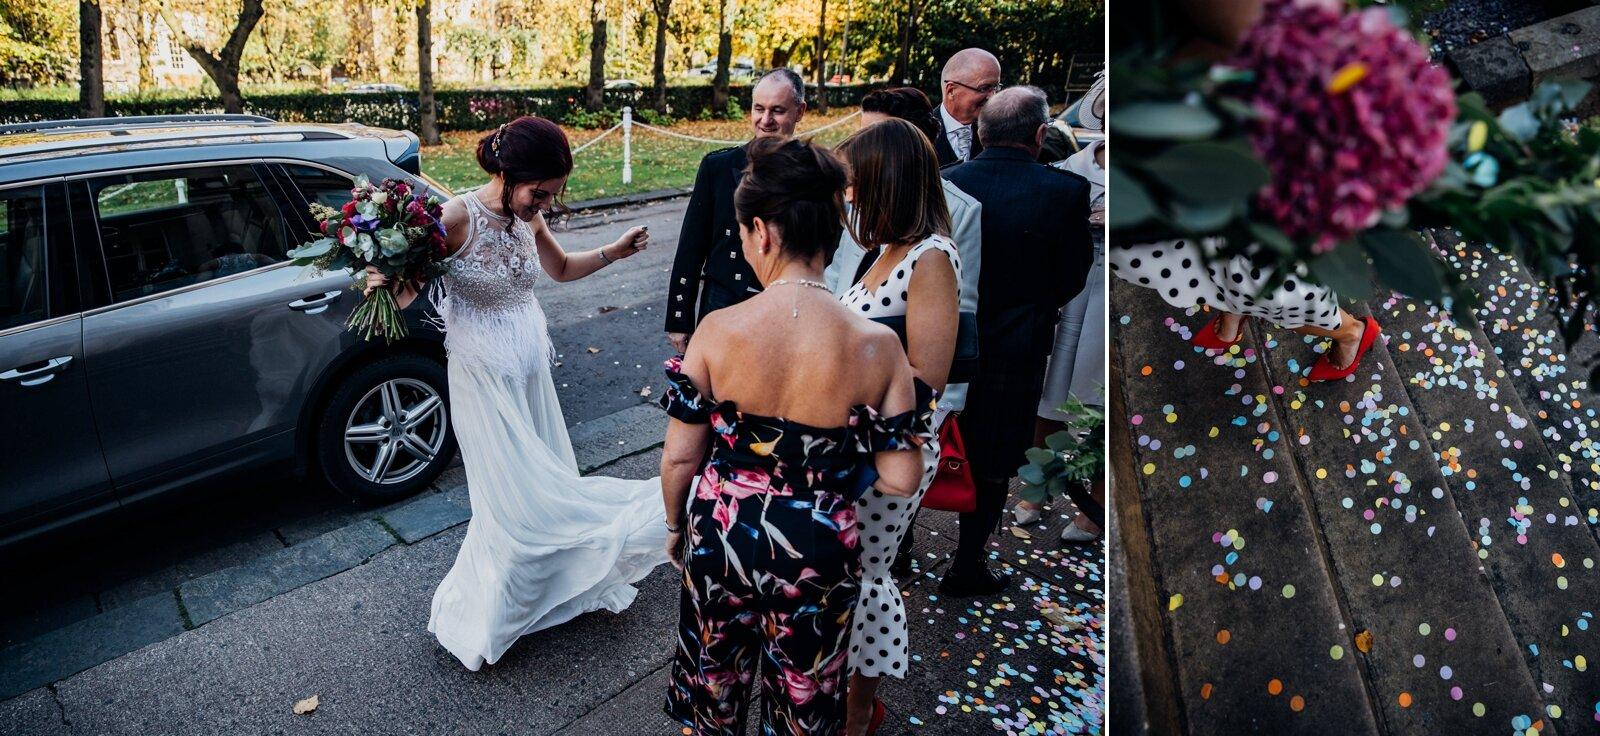 Andy&Szerdi-Photography_Ceremony_Elaine-Stephen-42.jpg